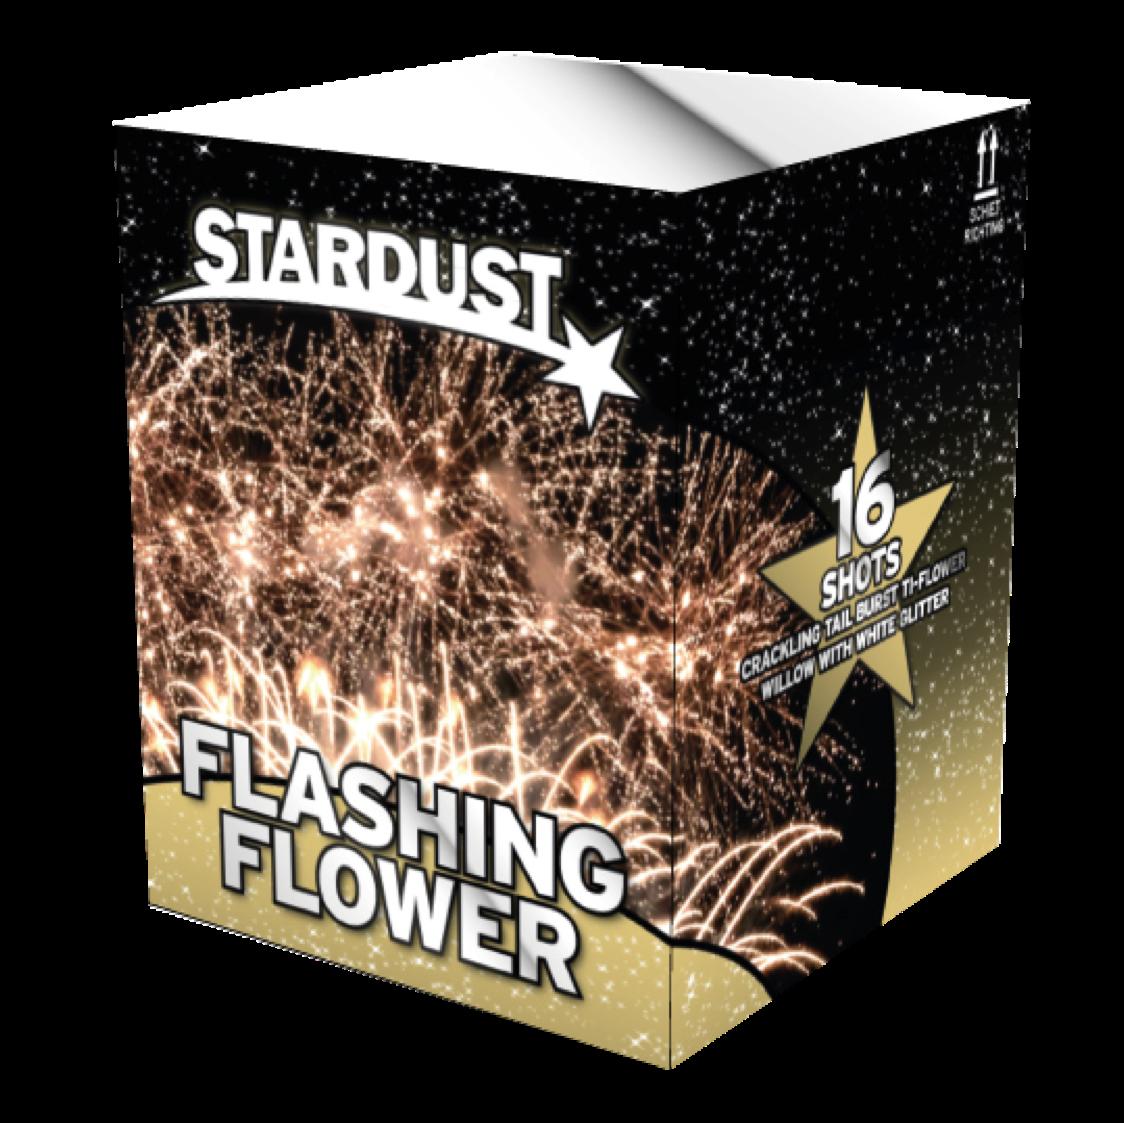 ART. 2201 FLASHING FLOWER (SD-01), 16 SHOTS